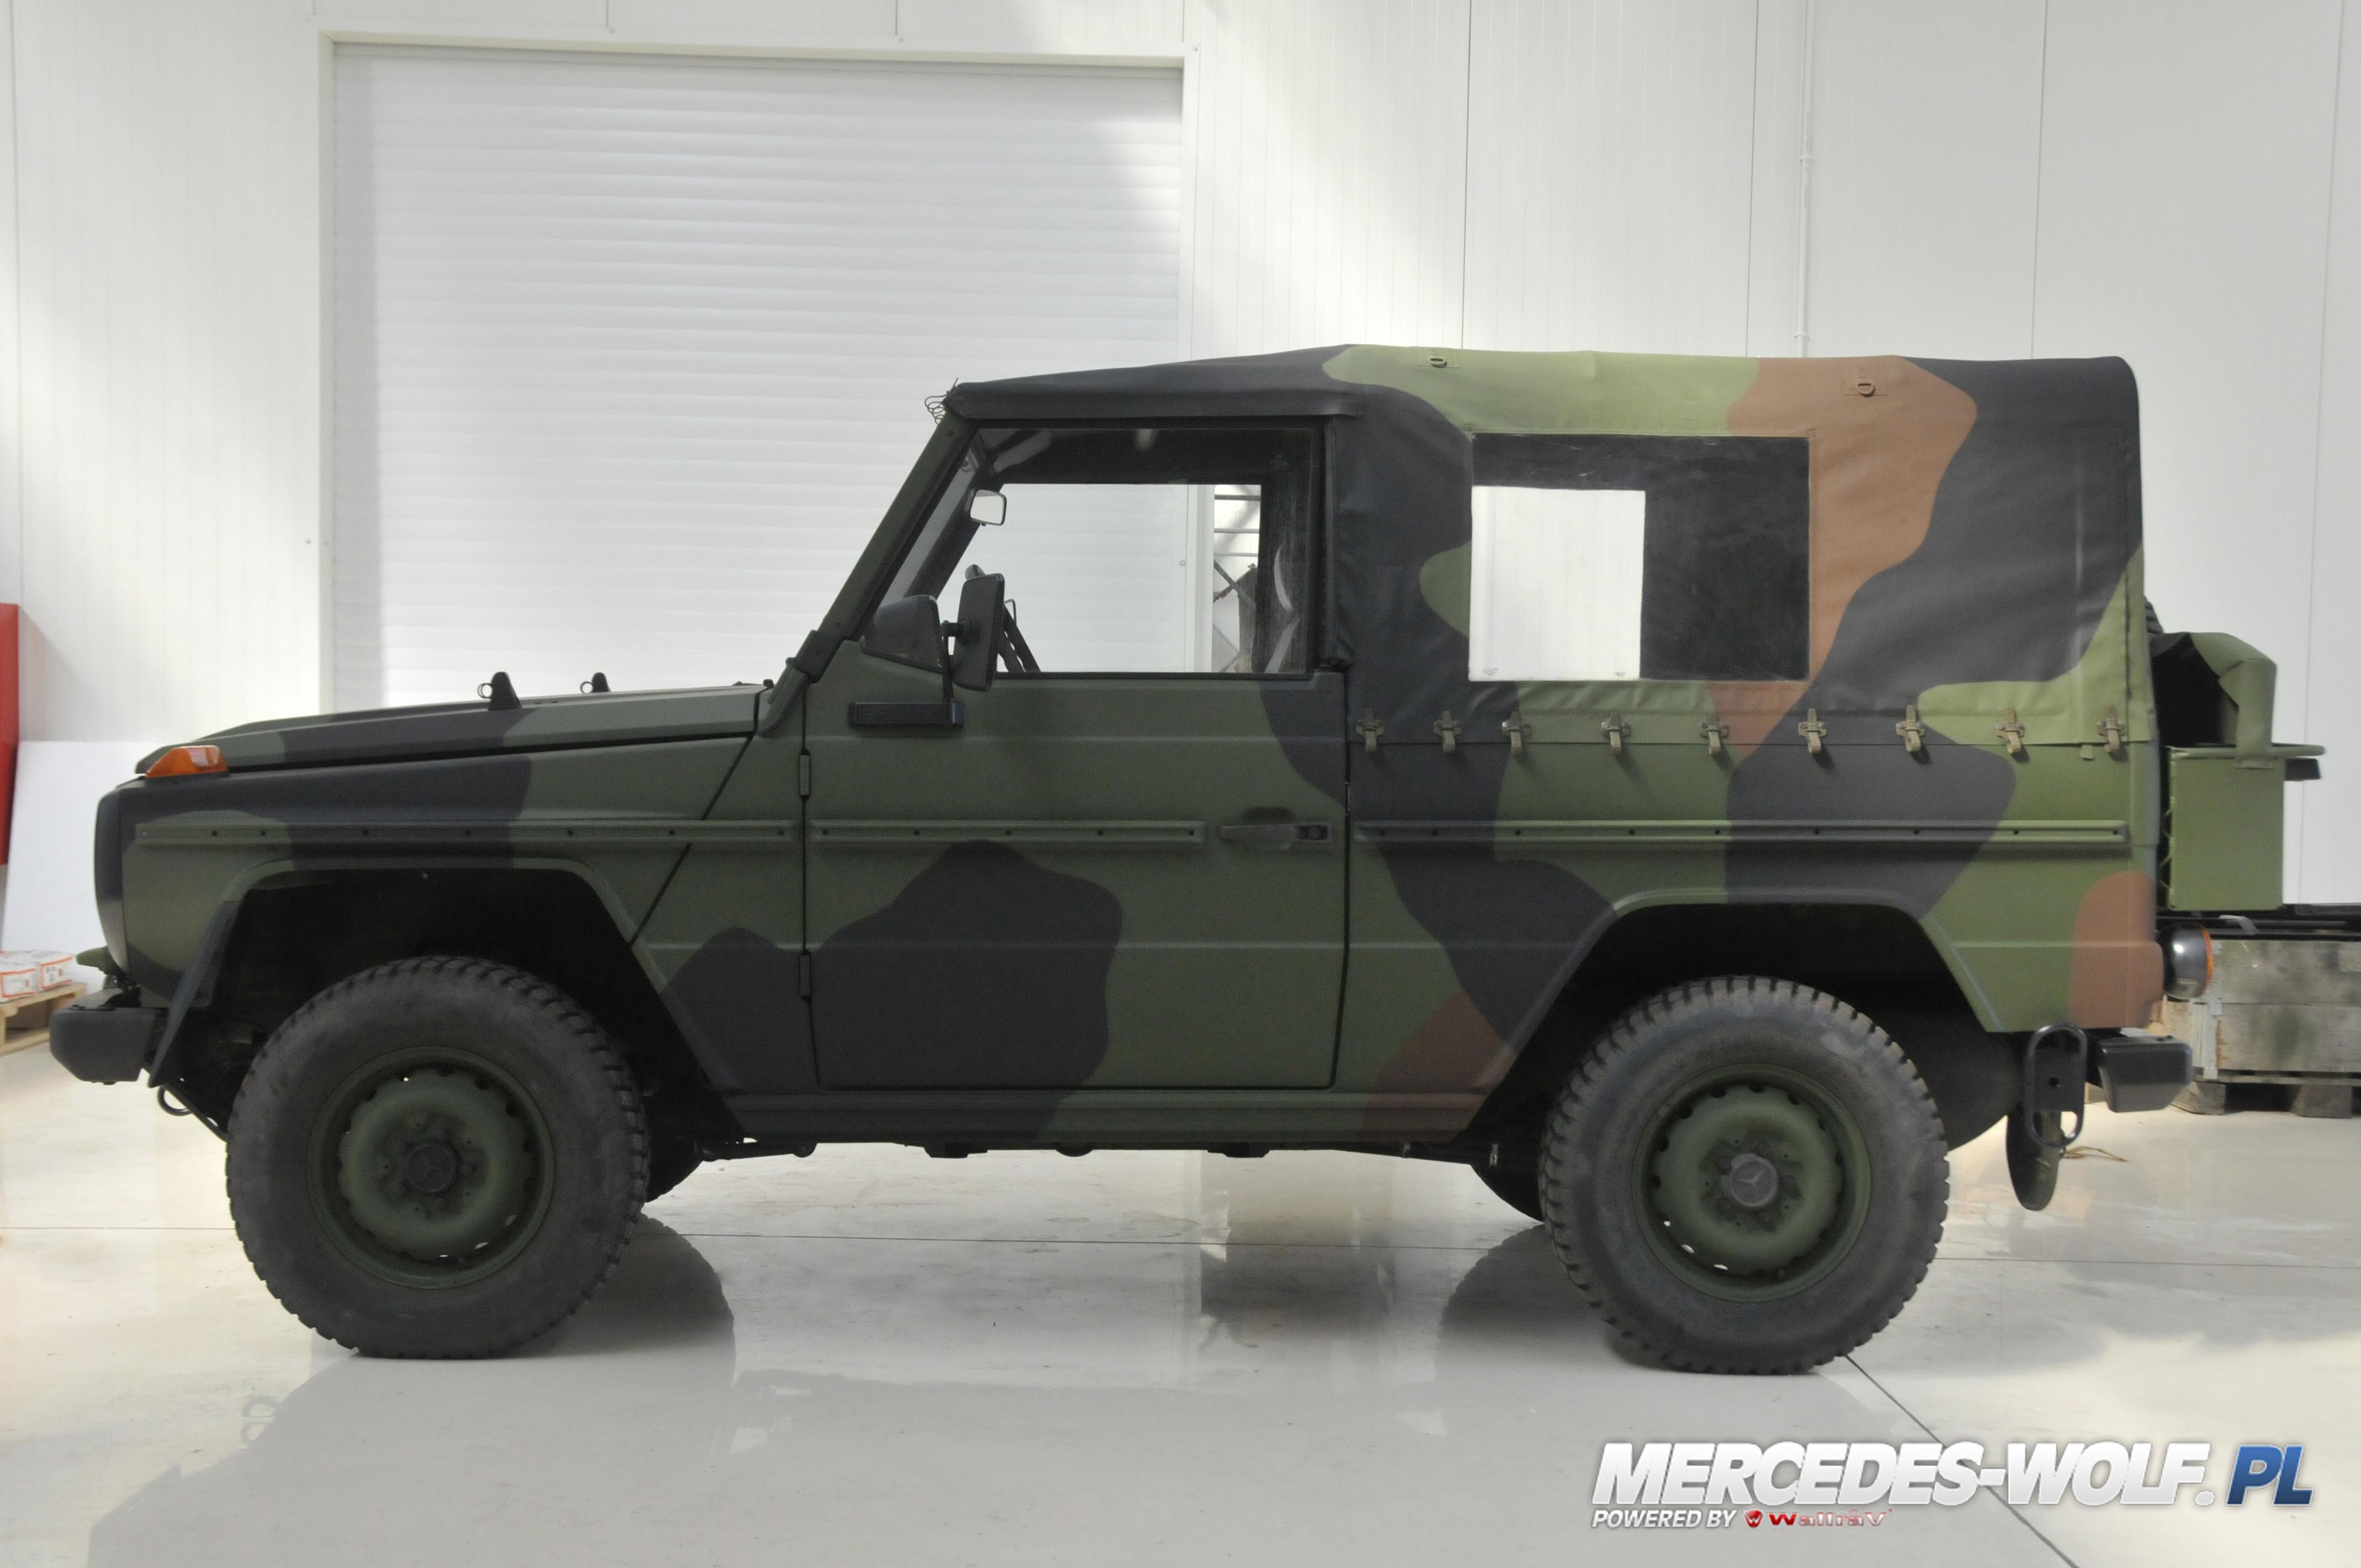 mercedes benz g 250gd 42 mercedes mercedes g class g force 1 en mercedes g. Black Bedroom Furniture Sets. Home Design Ideas